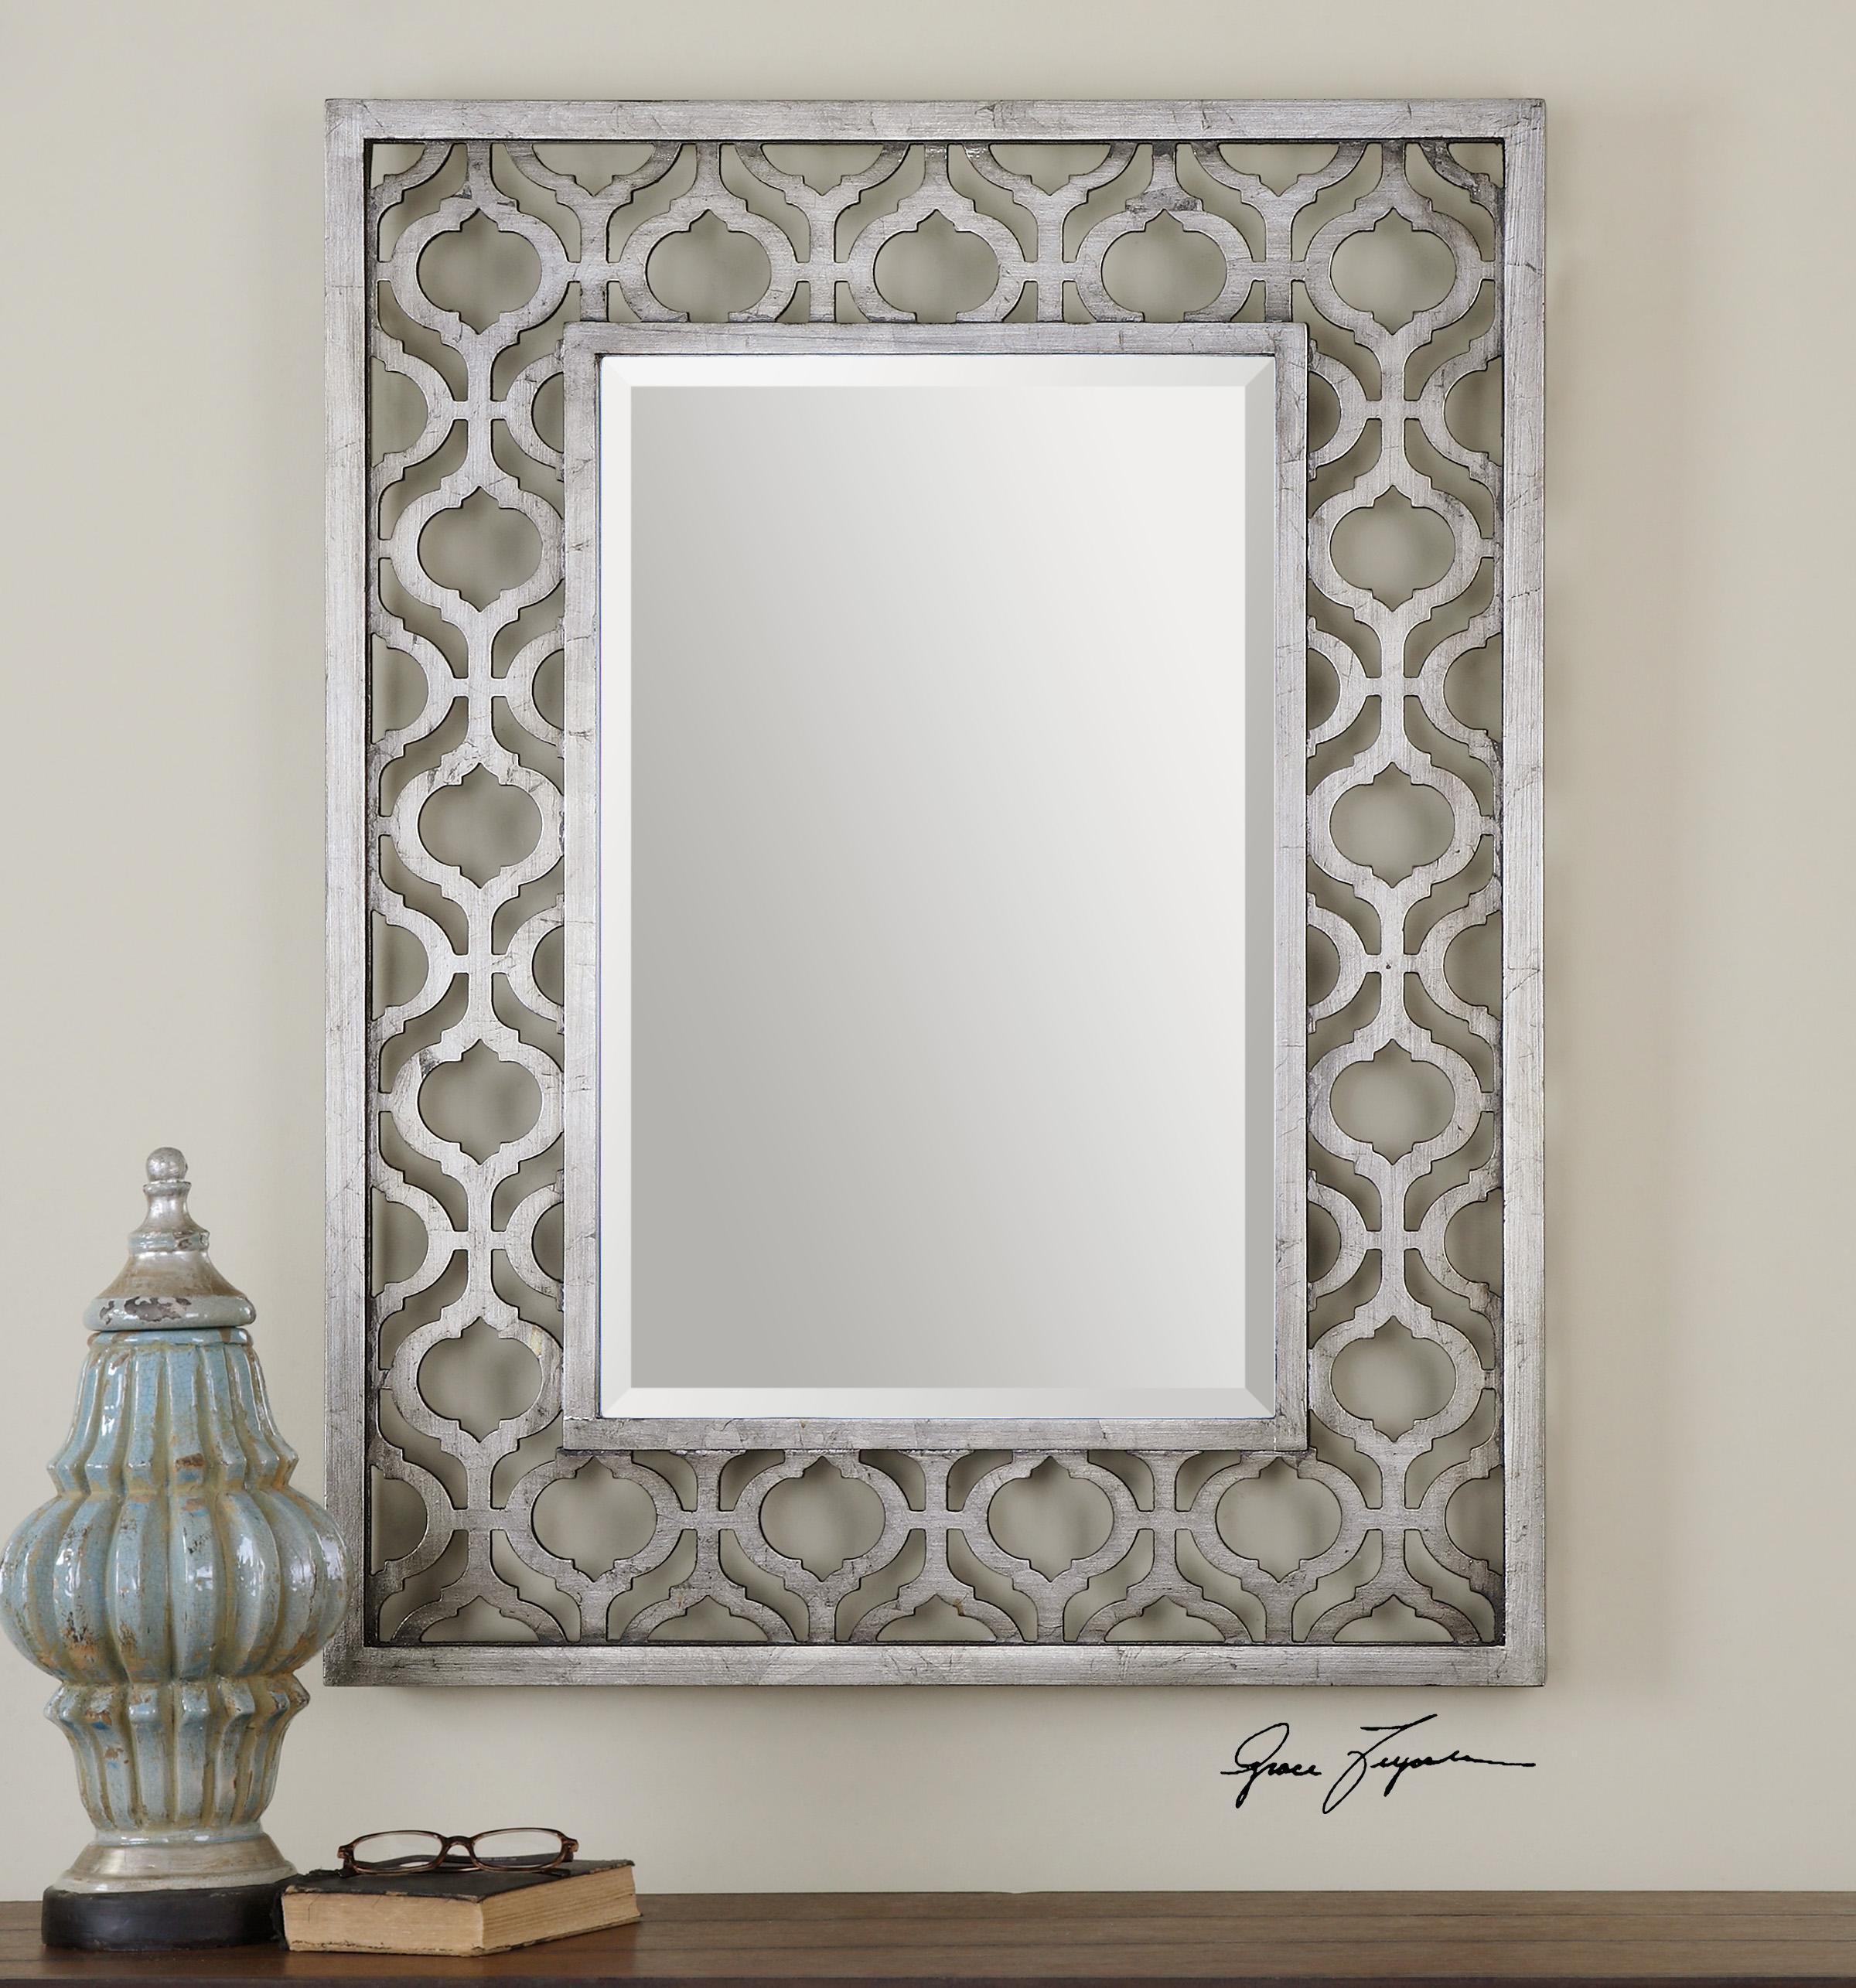 Uttermost MirrorsSorbolo Silver Mirror; Uttermost MirrorsSorbolo Silver  Mirror